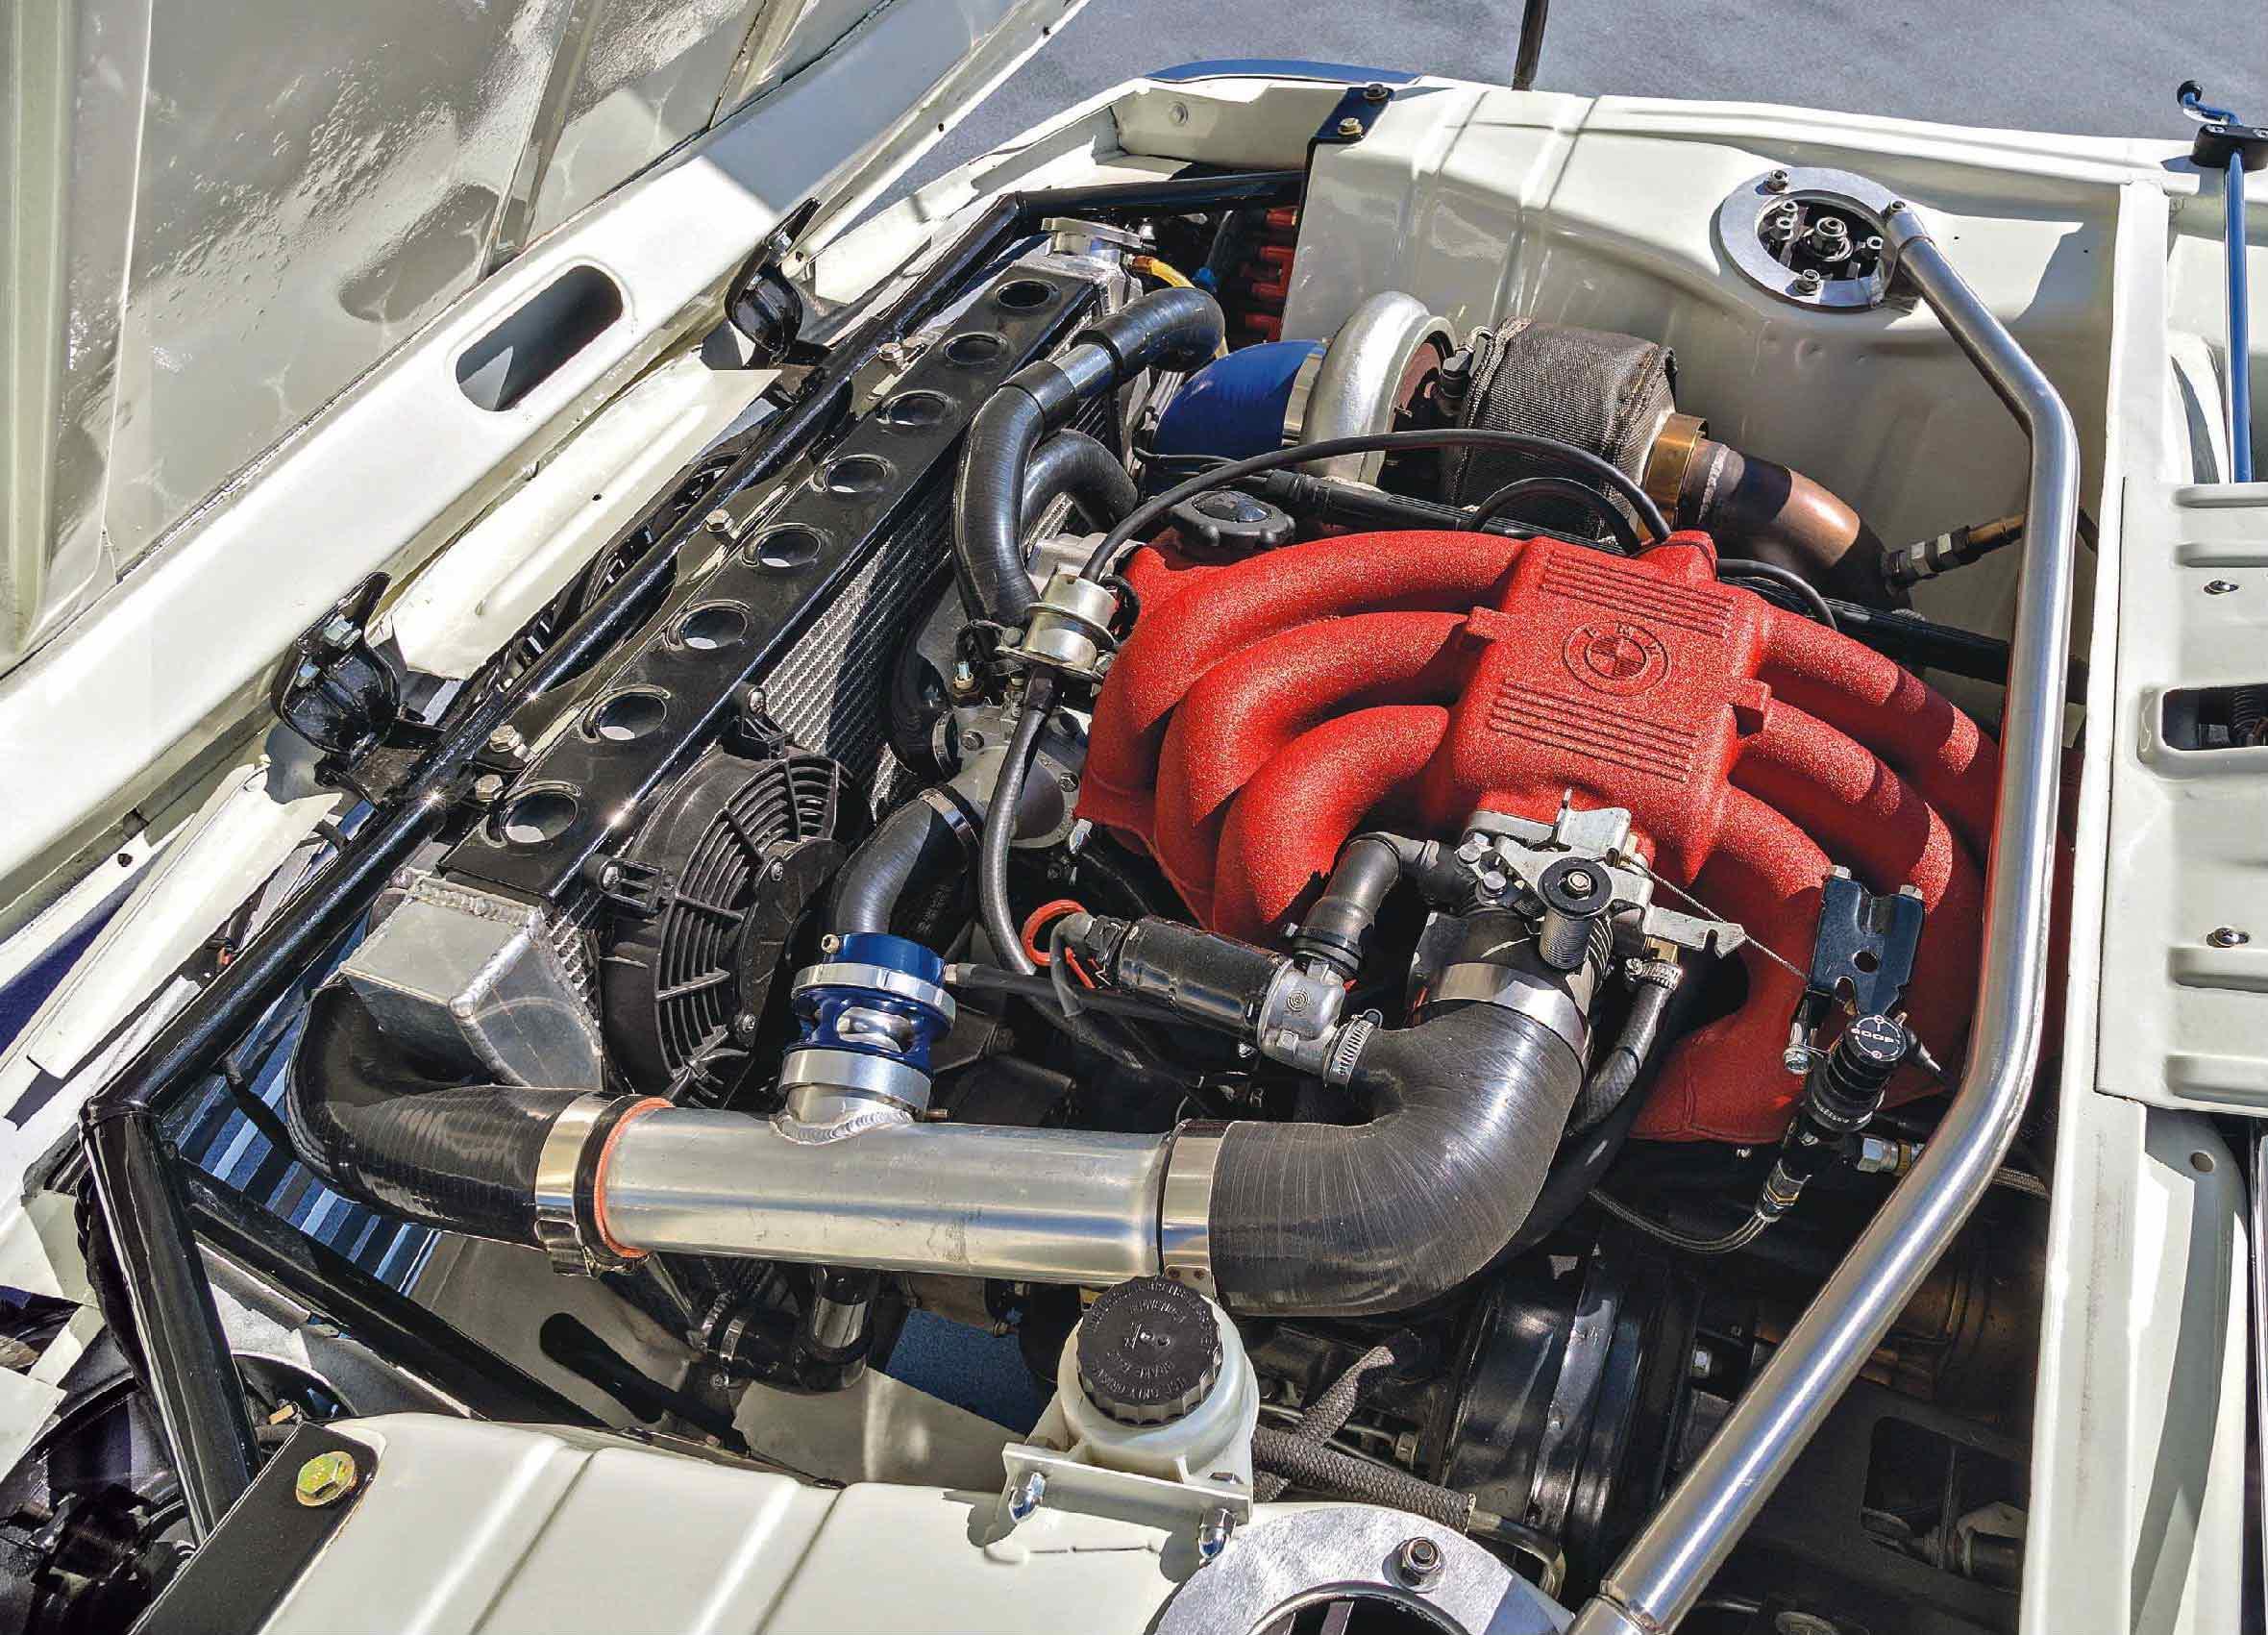 Retro Rocket Turbo 500bhp M20b27 Engined Bmw 2002 Drive My Blogs